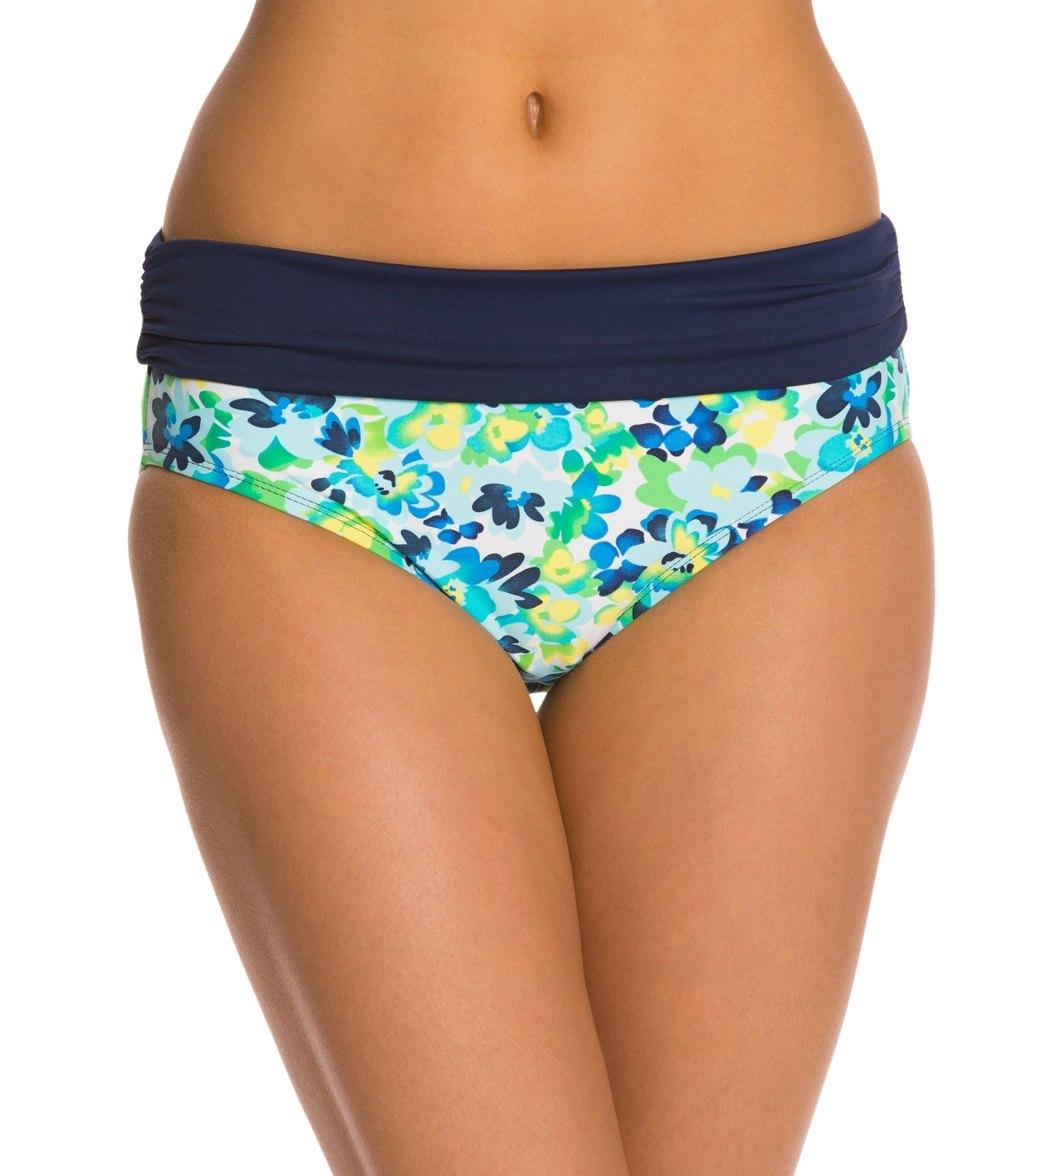 f4a2954d41 Beach House Swimwear Clearwater Floral Fold Over Shirred Bikini ...